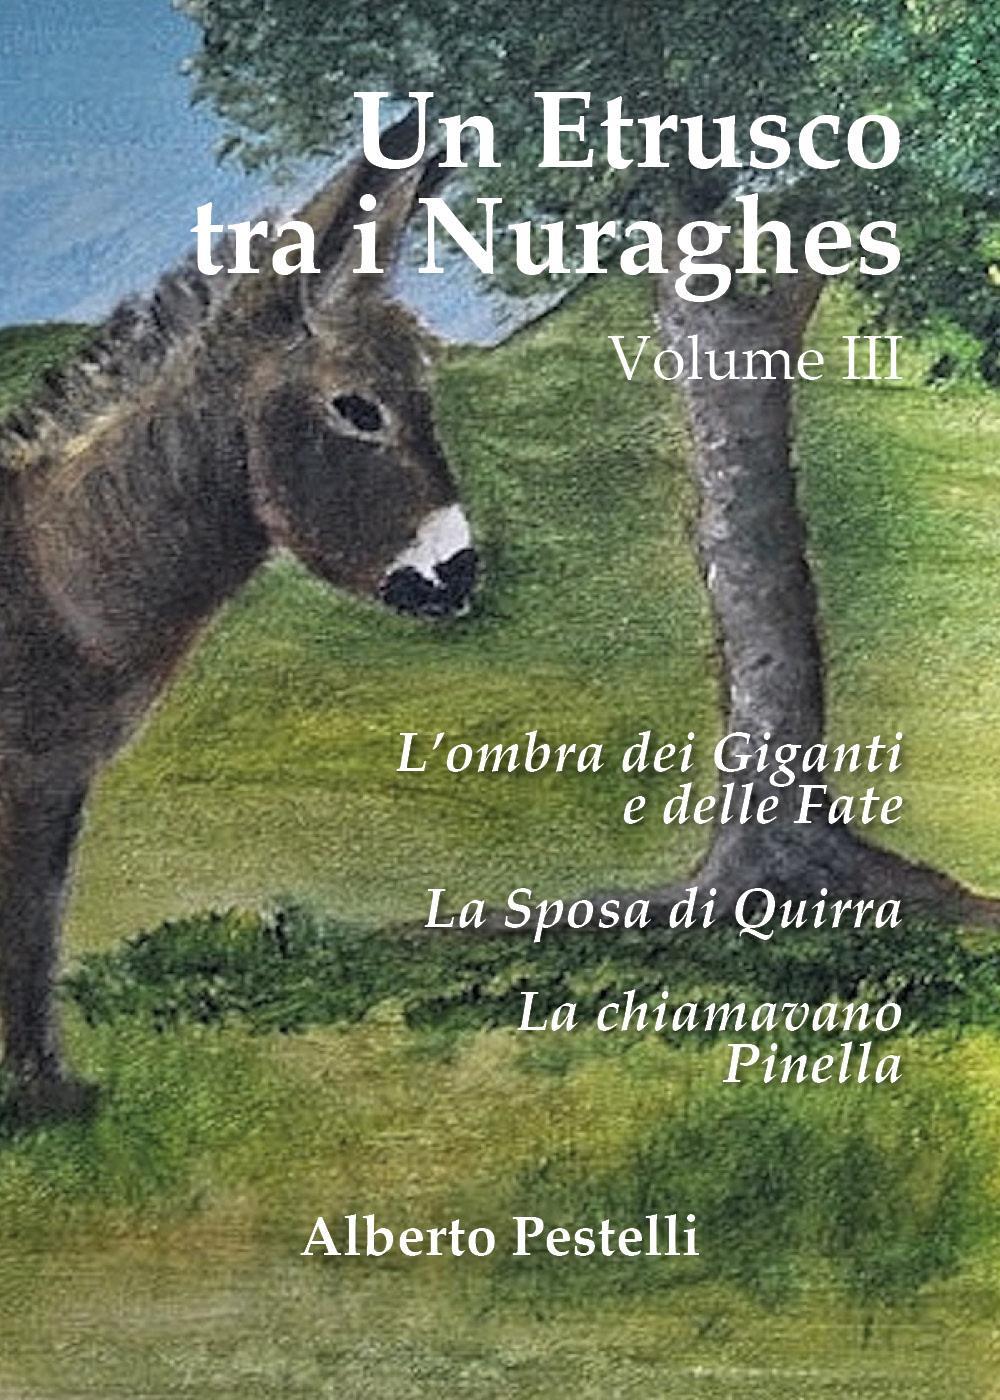 Un Etrusco tra i Nuraghes - Volume III